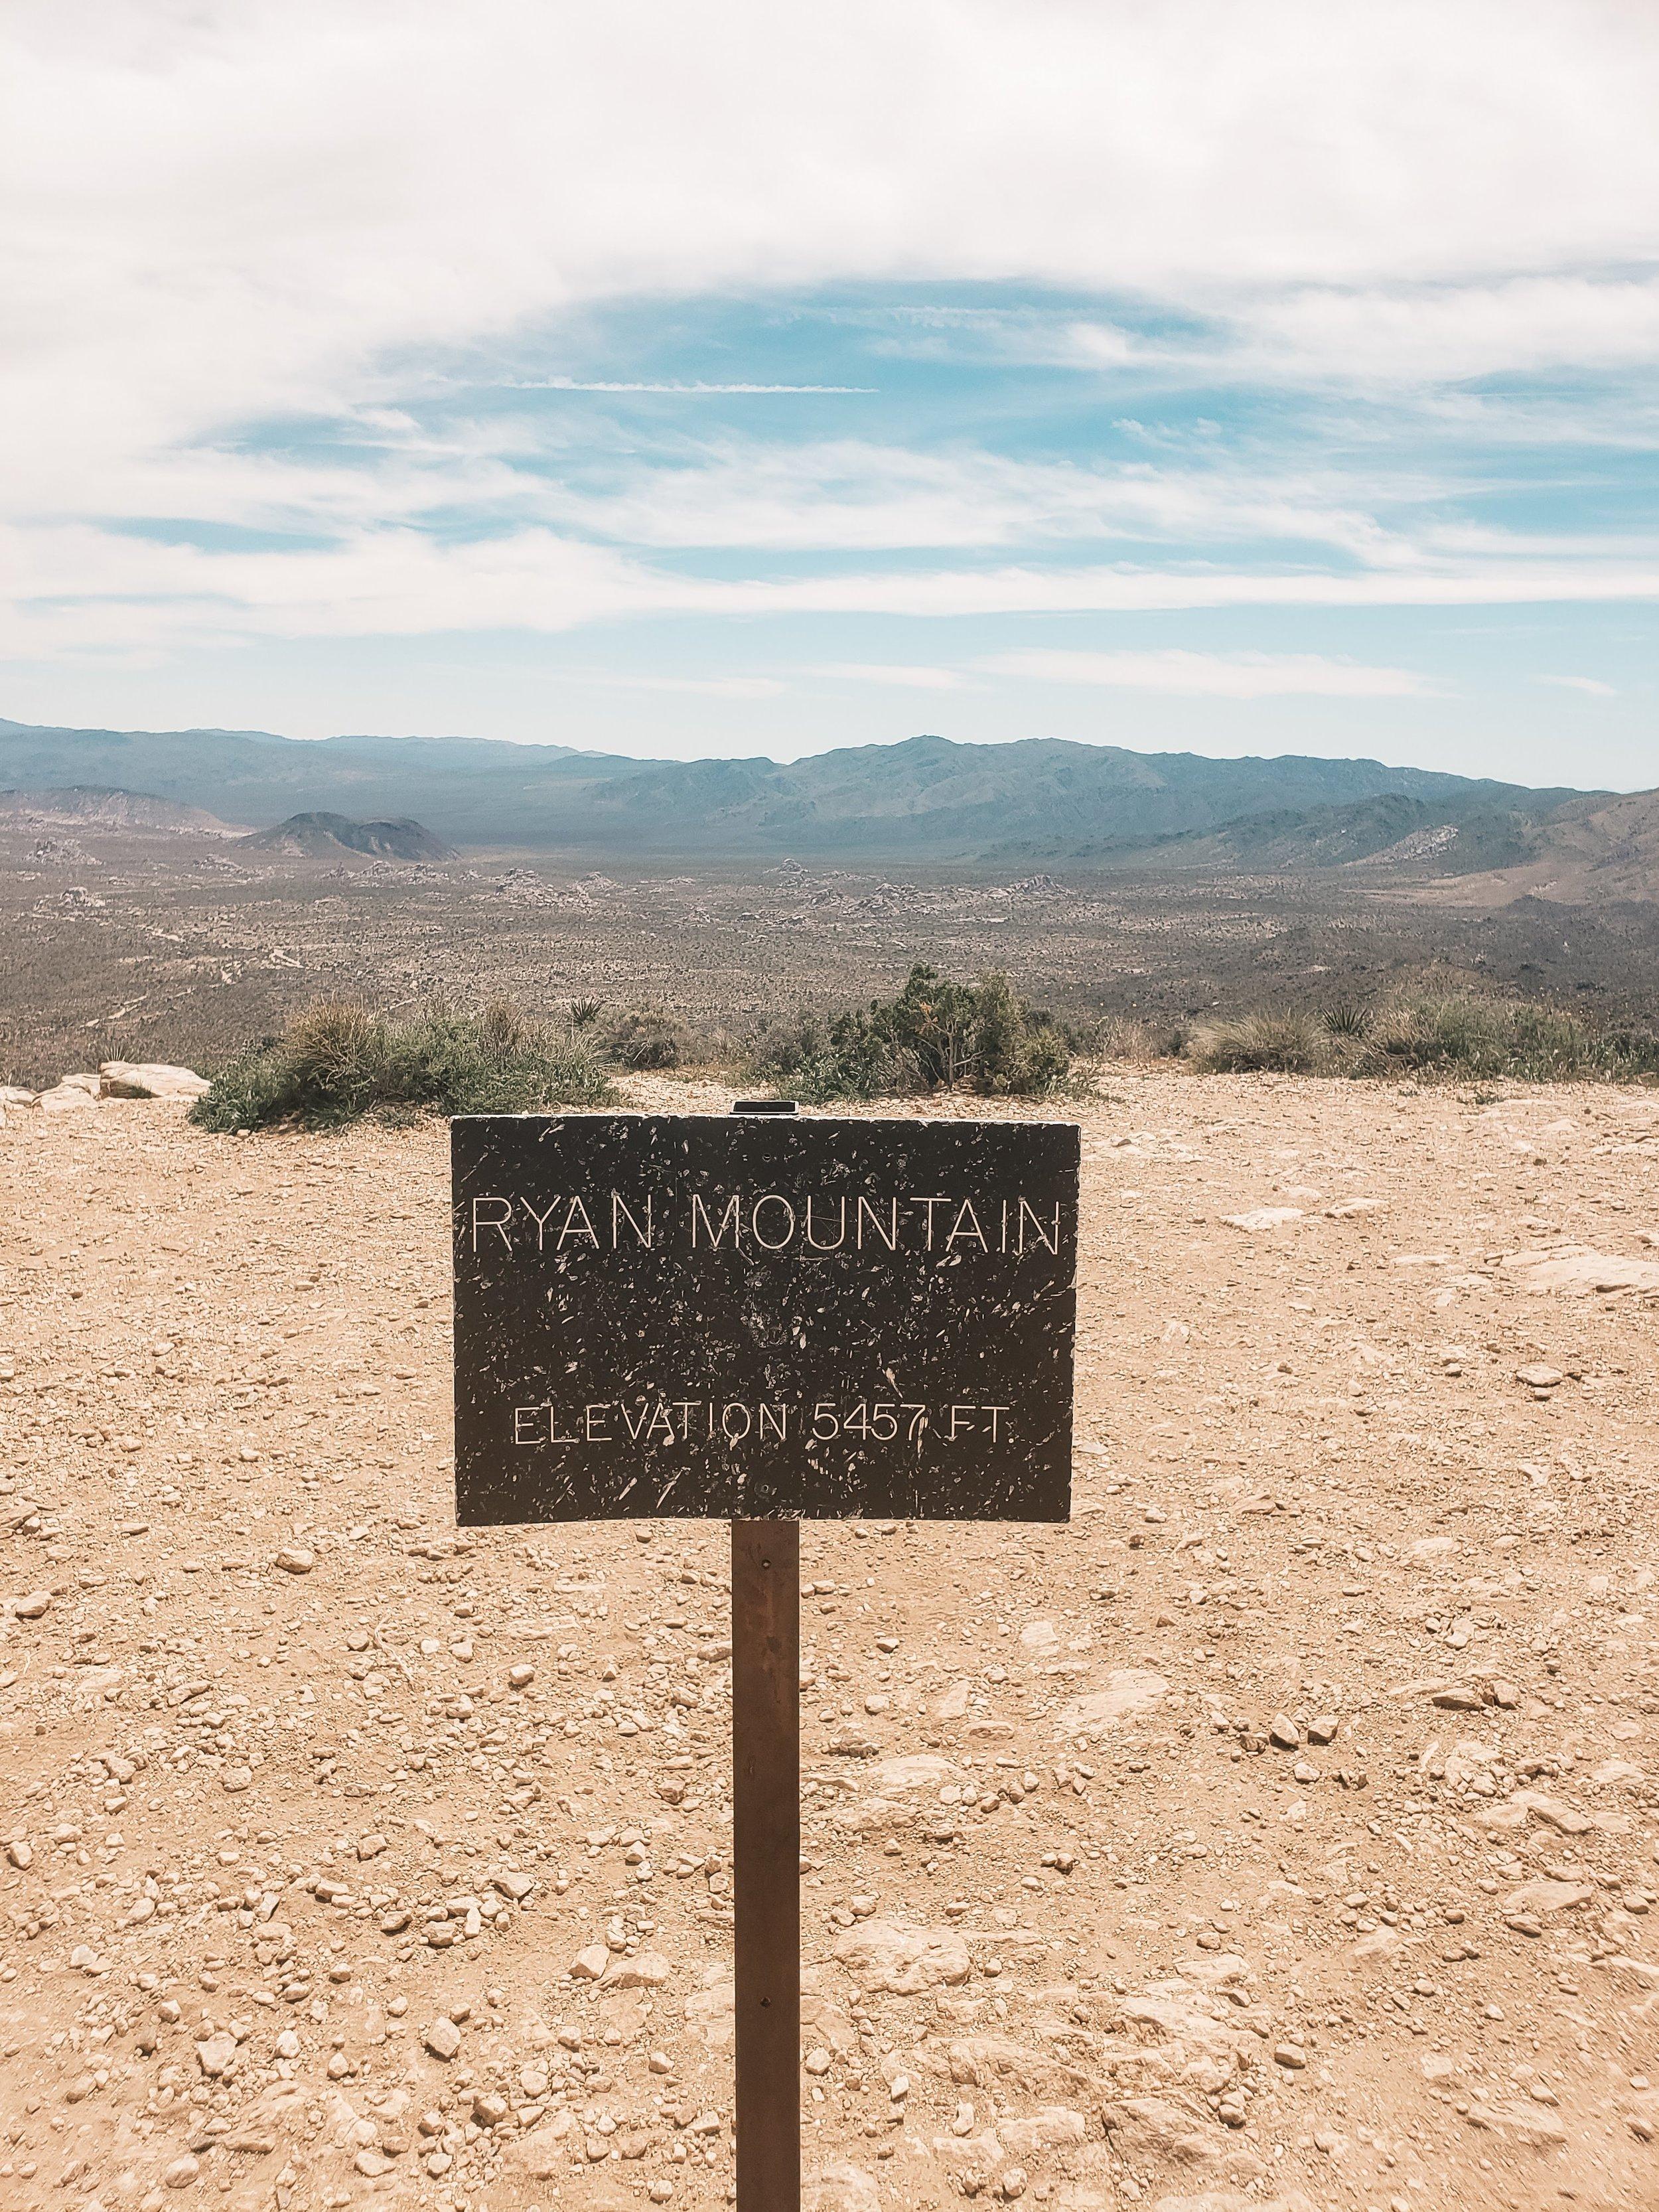 Ryan Mountain Trail - Joshua Tree National Park